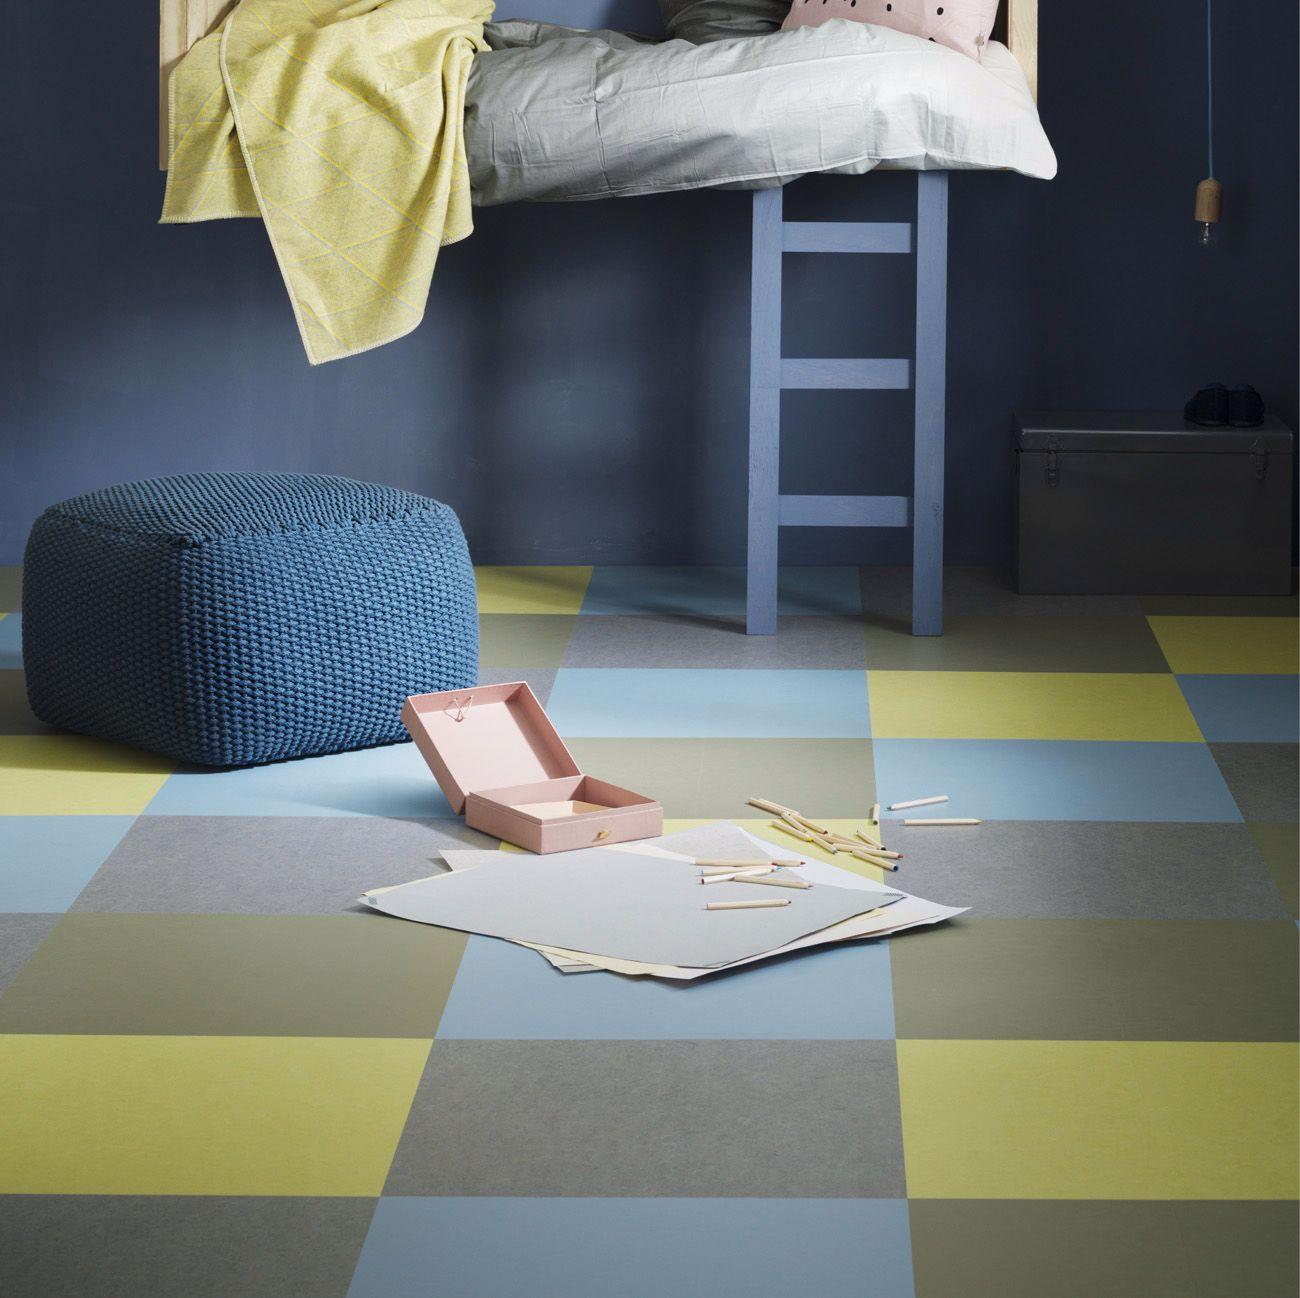 Marmoleum click : des possibilités infinies de conception !